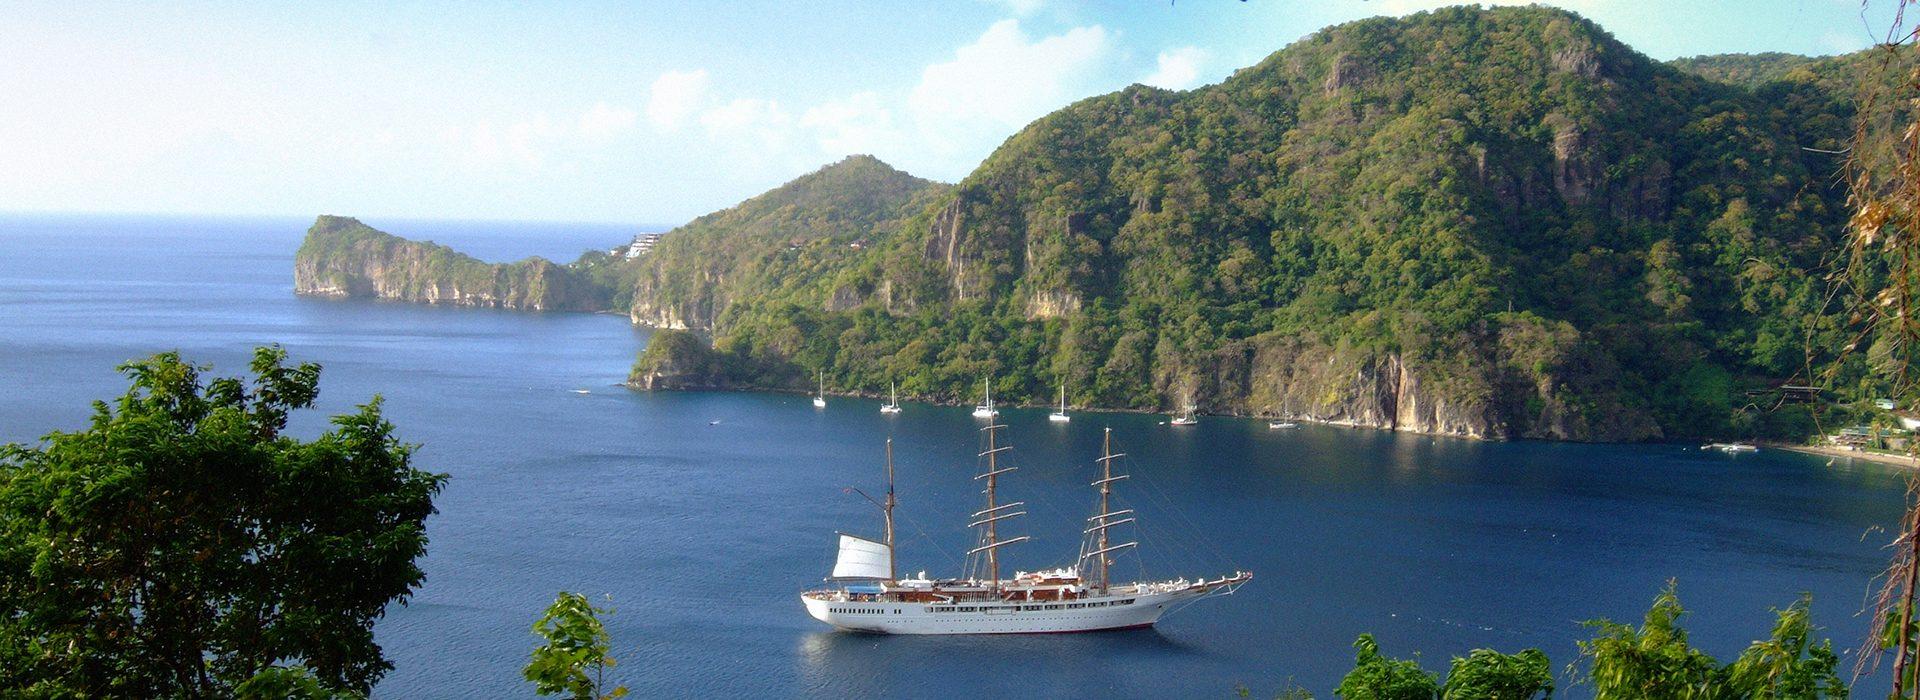 Segelschiff Sea Cloud